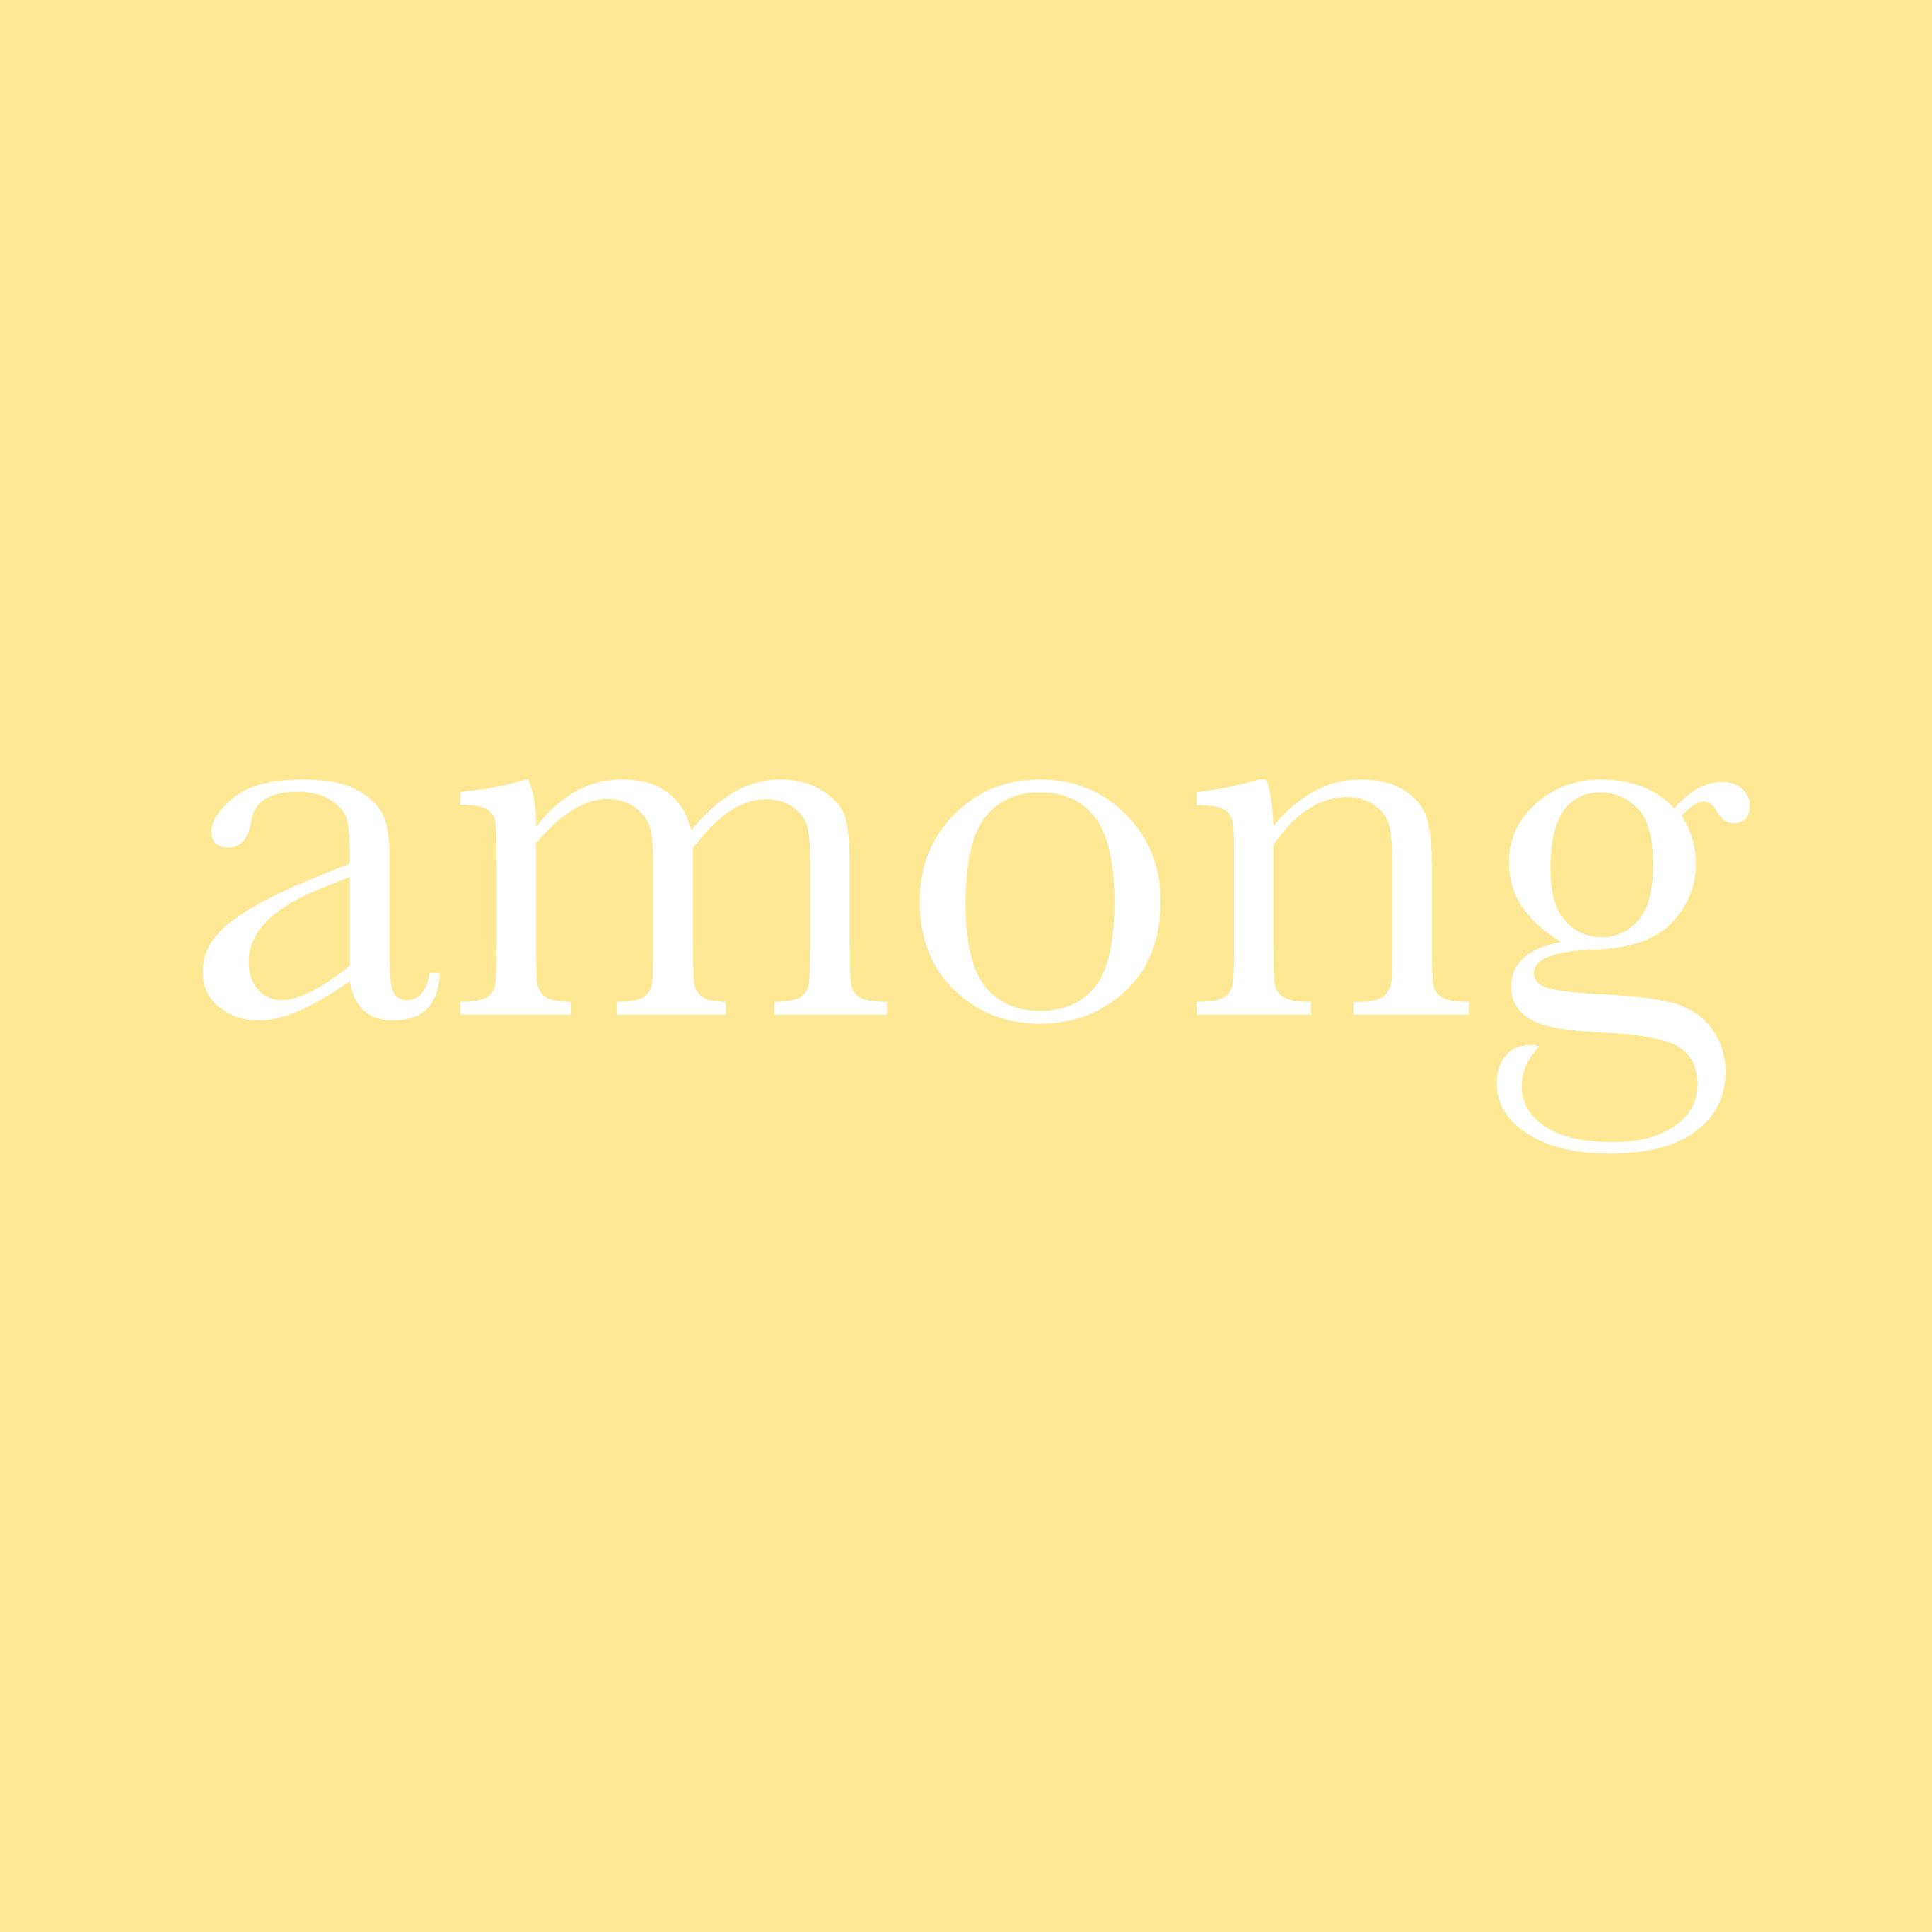 每日一字:among